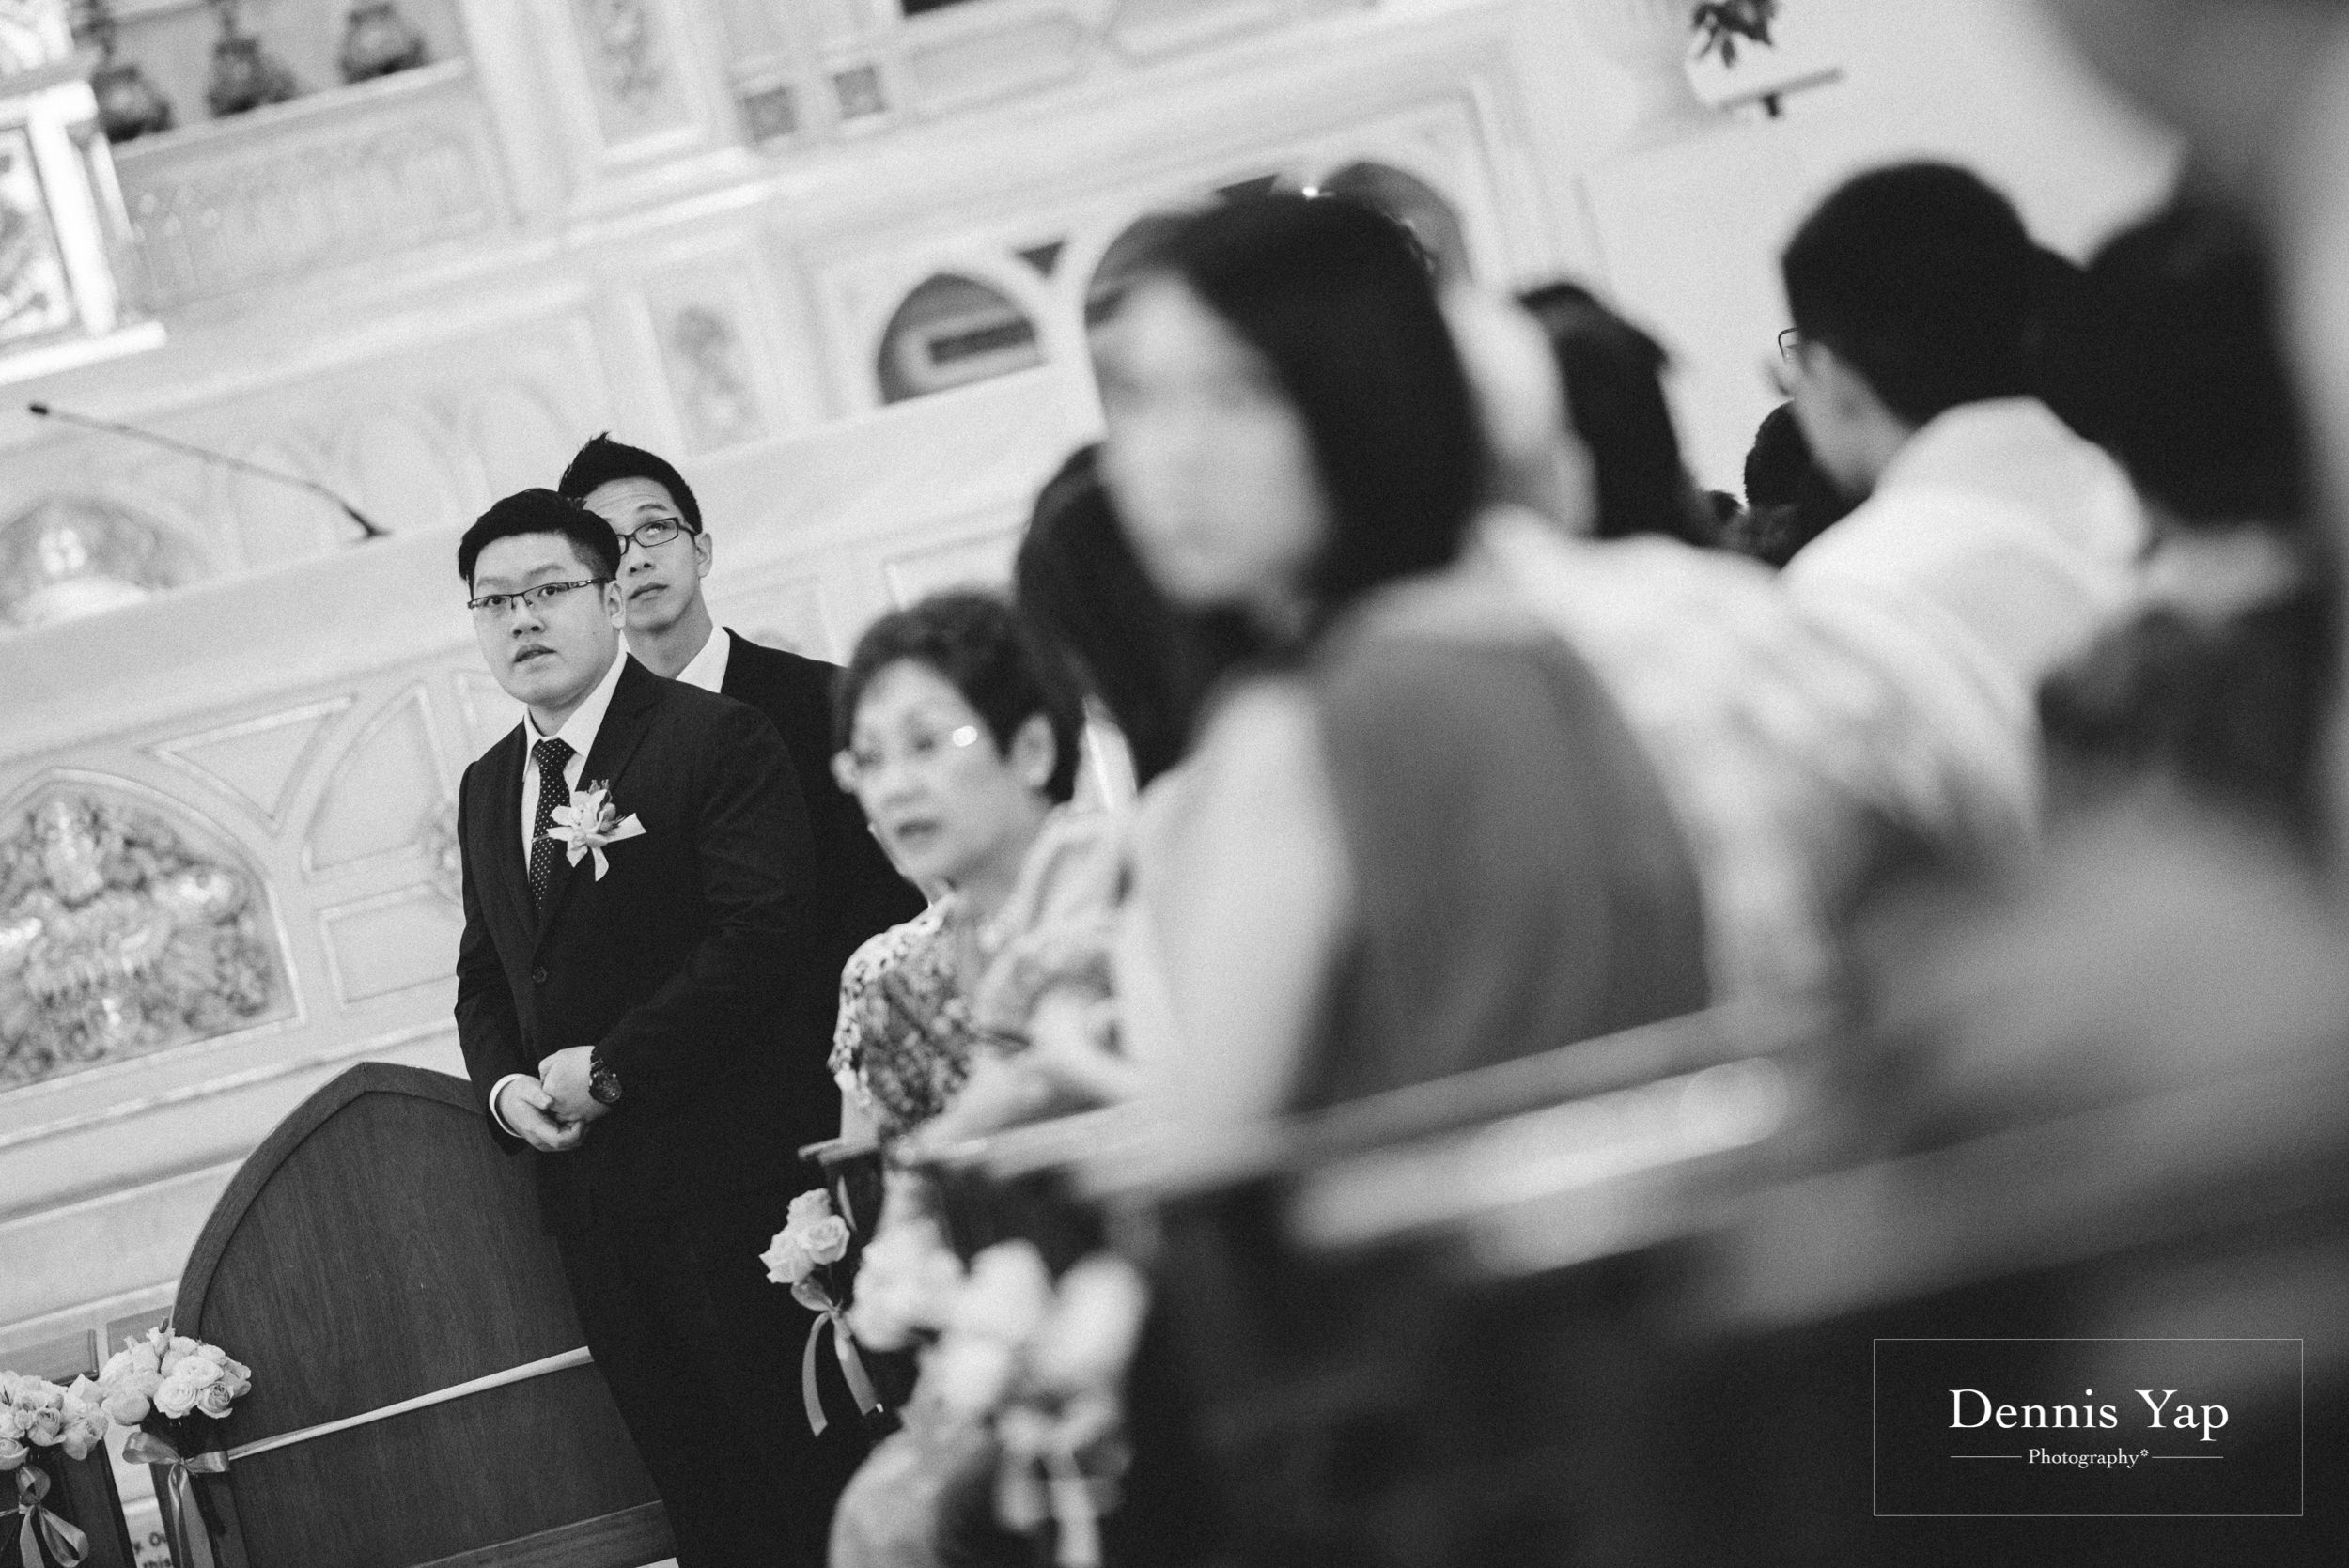 jinhan jacqui church wedding xavier catholic dennis yap photography malaysia wedding photographer-12.jpg